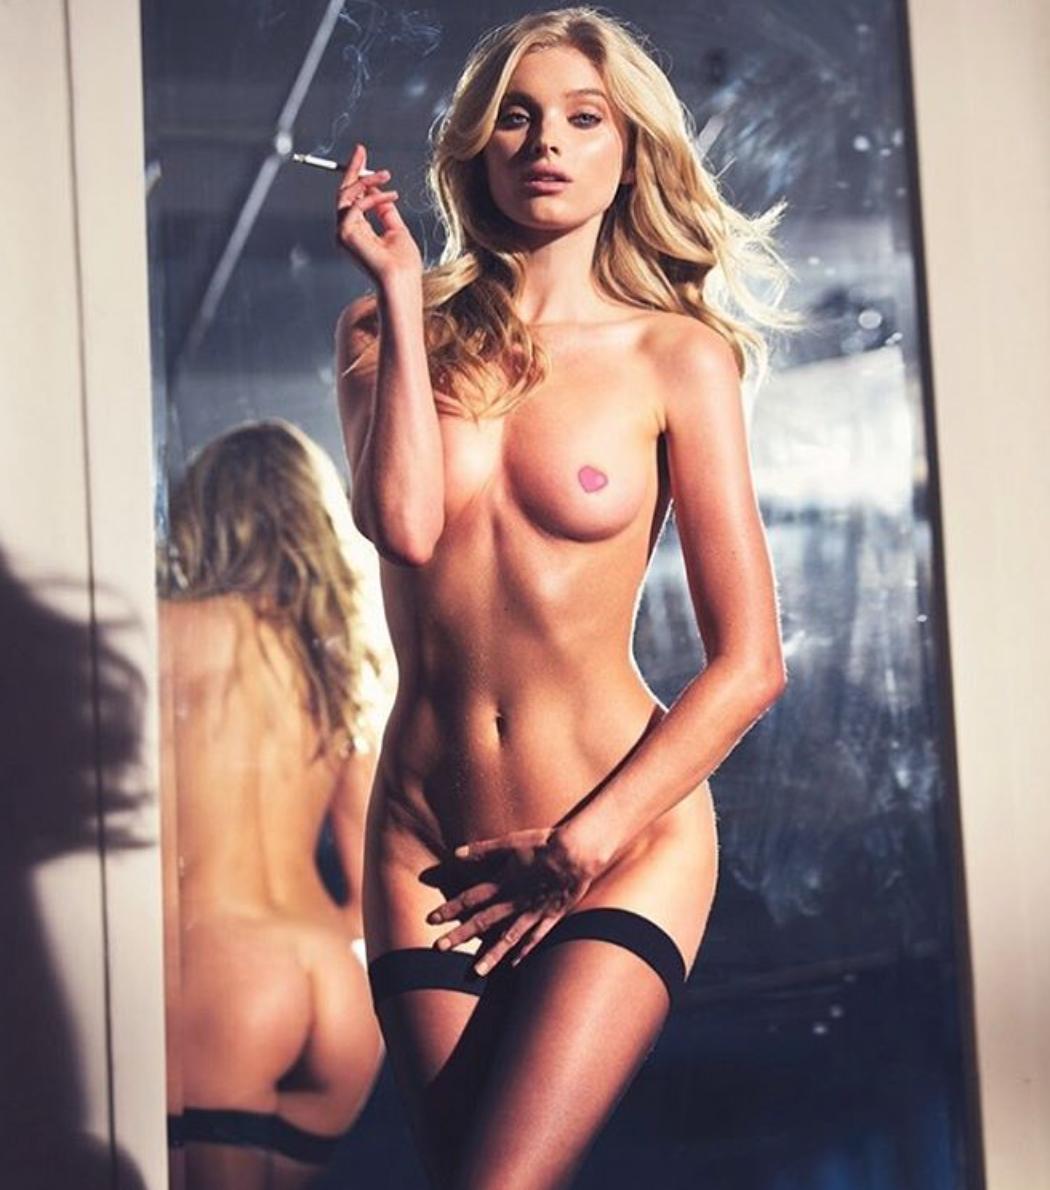 Fuck Elsa Hosk nudes (48 photos), Topless, Bikini, Twitter, braless 2019